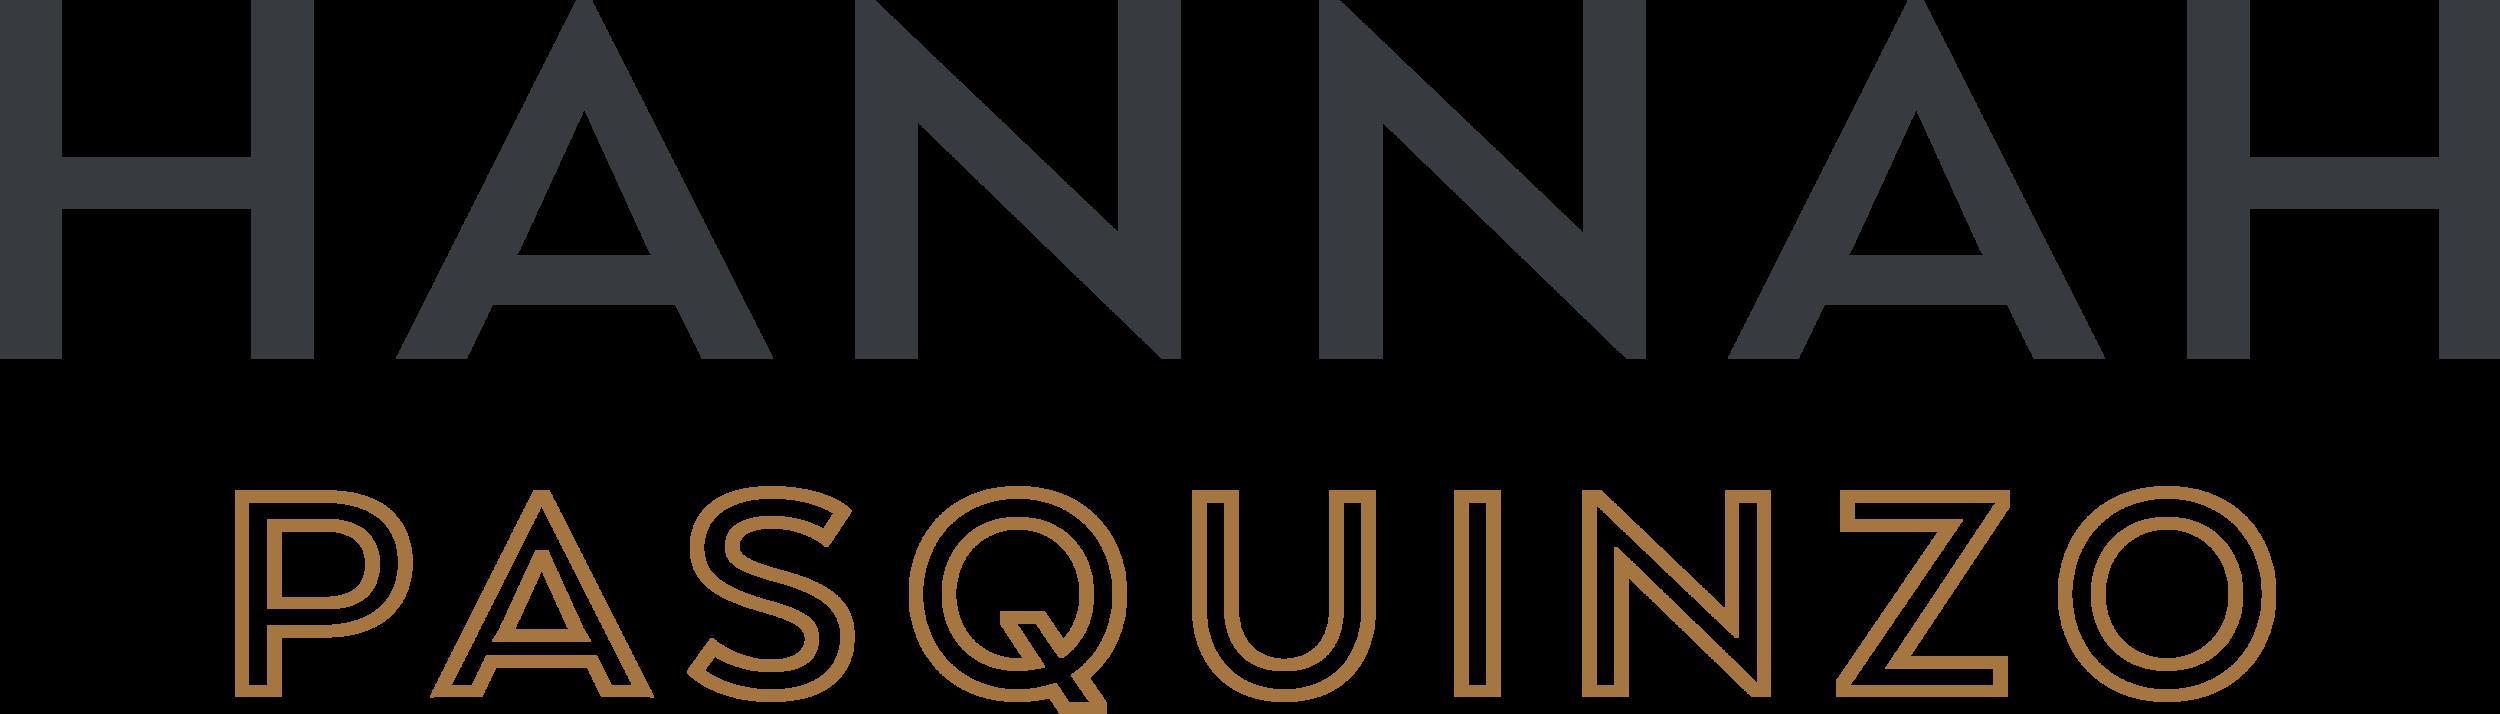 Hannah-Pasquinzo-Text-Logo-BLACK-BROWN.png